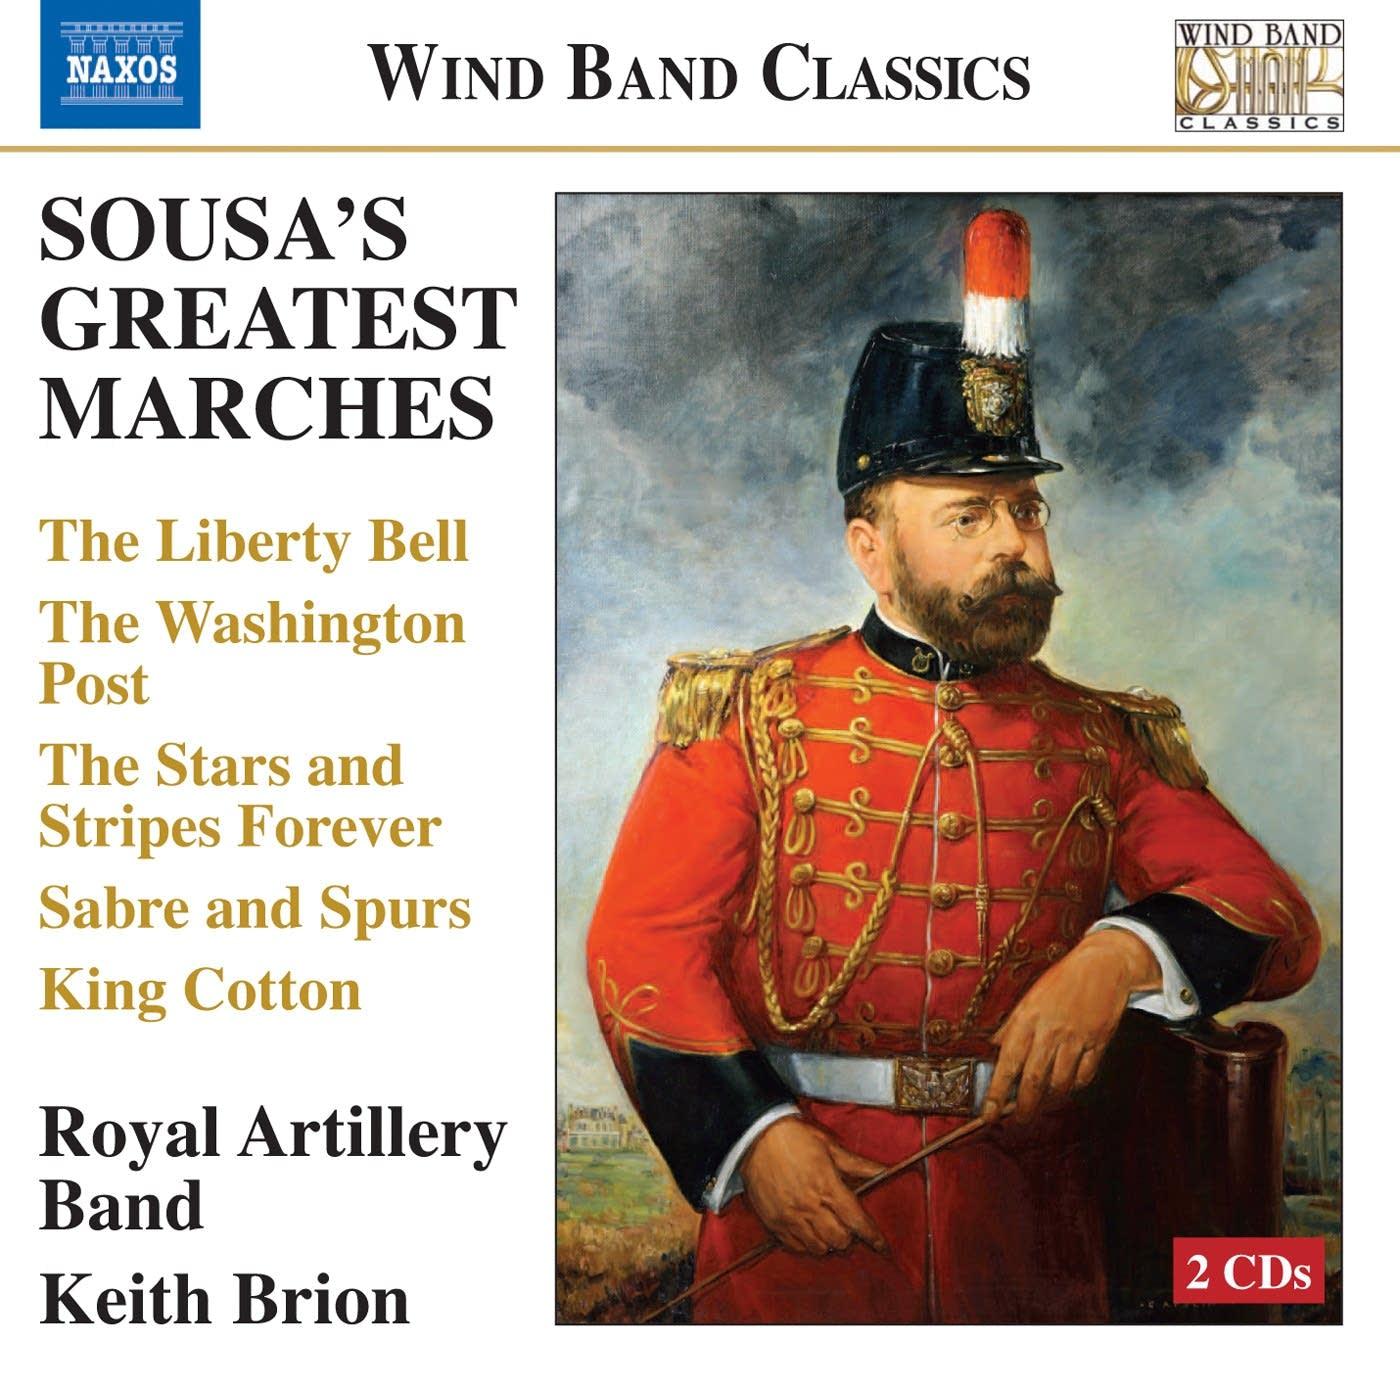 John Philip Sousa - The Wisconsin Forward March